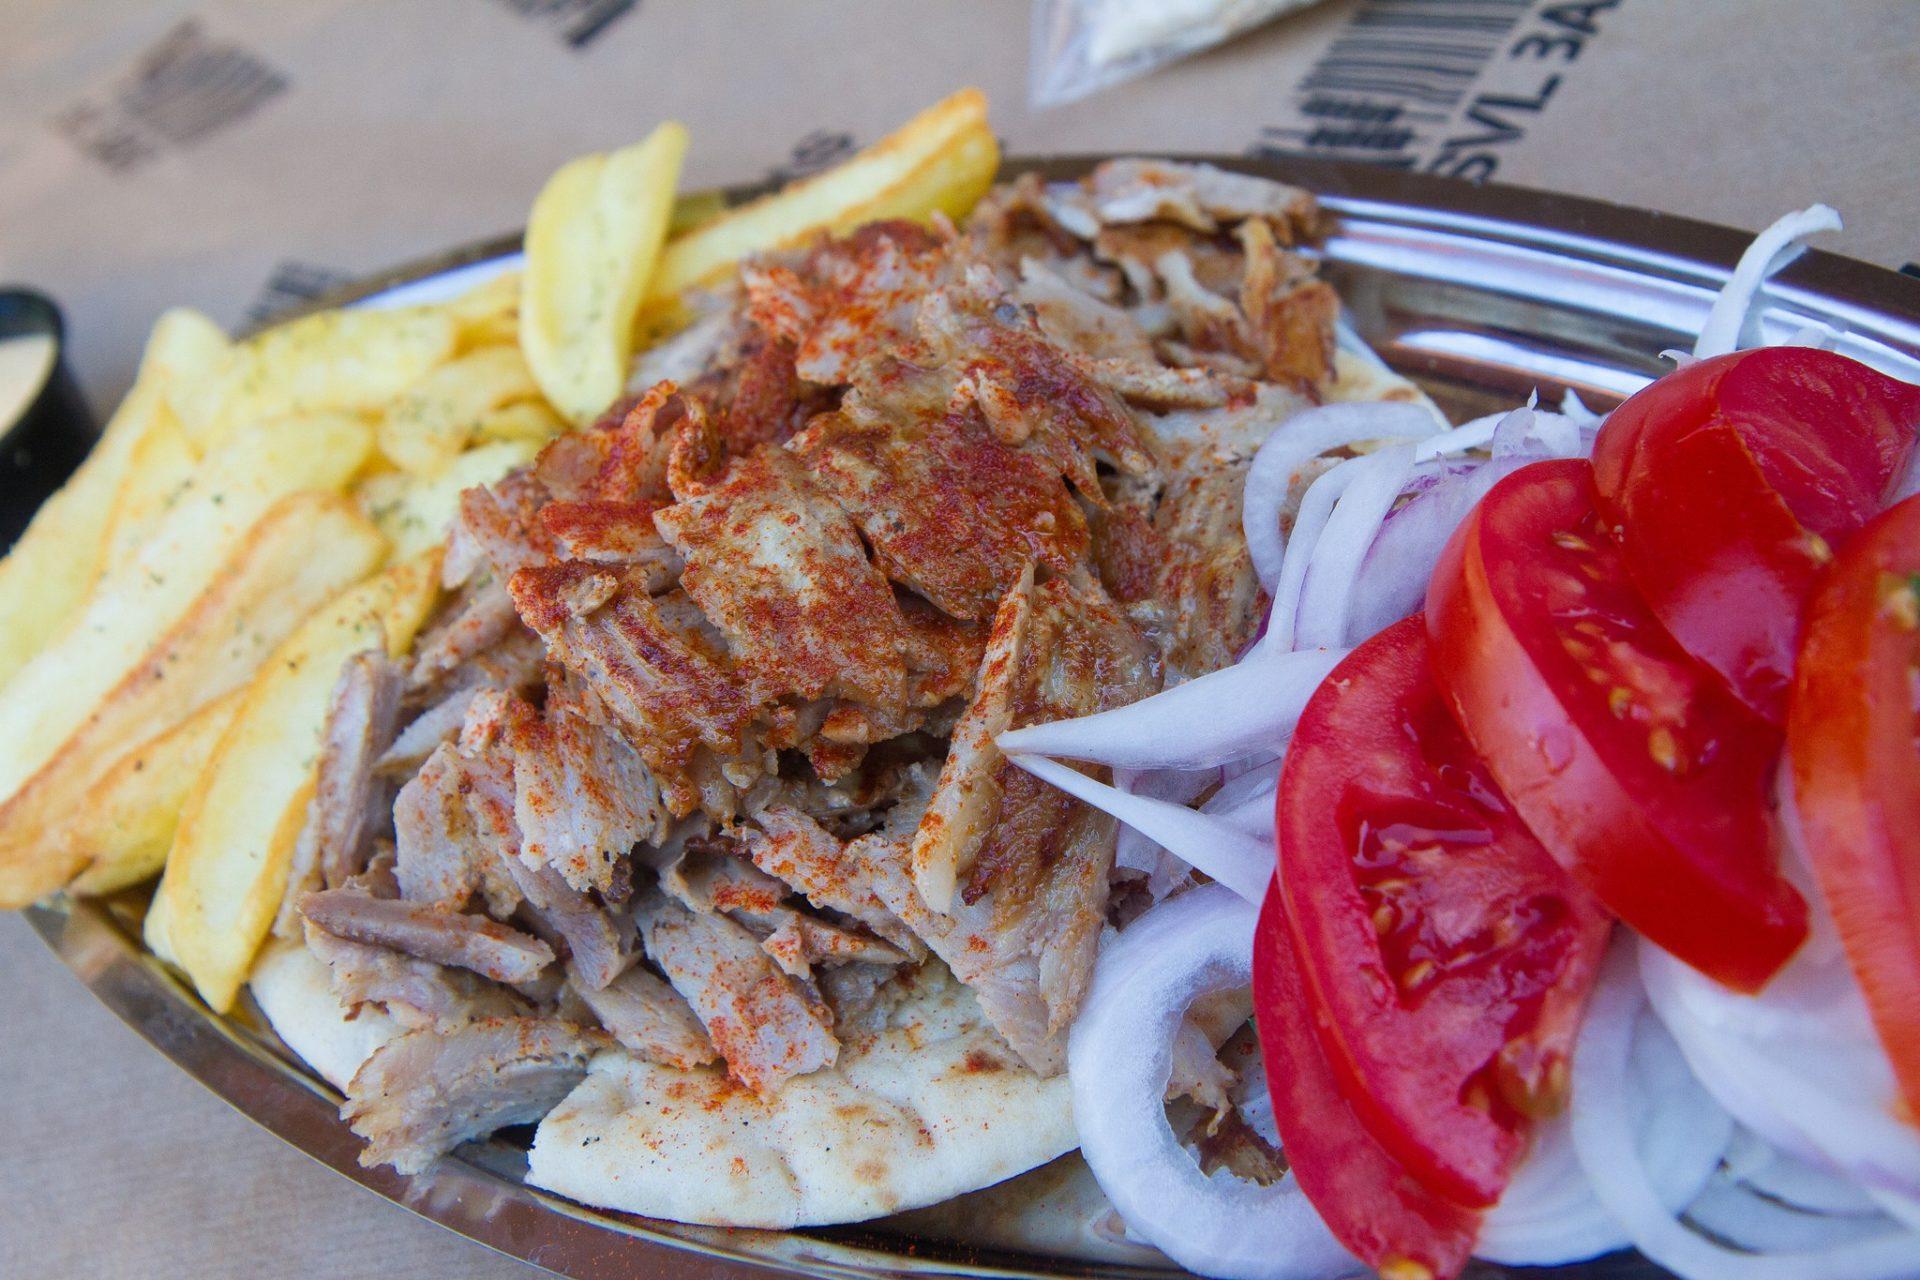 Souvlaki in Athens, Greece. Photo by Garrett Ziegler via Flickr CC